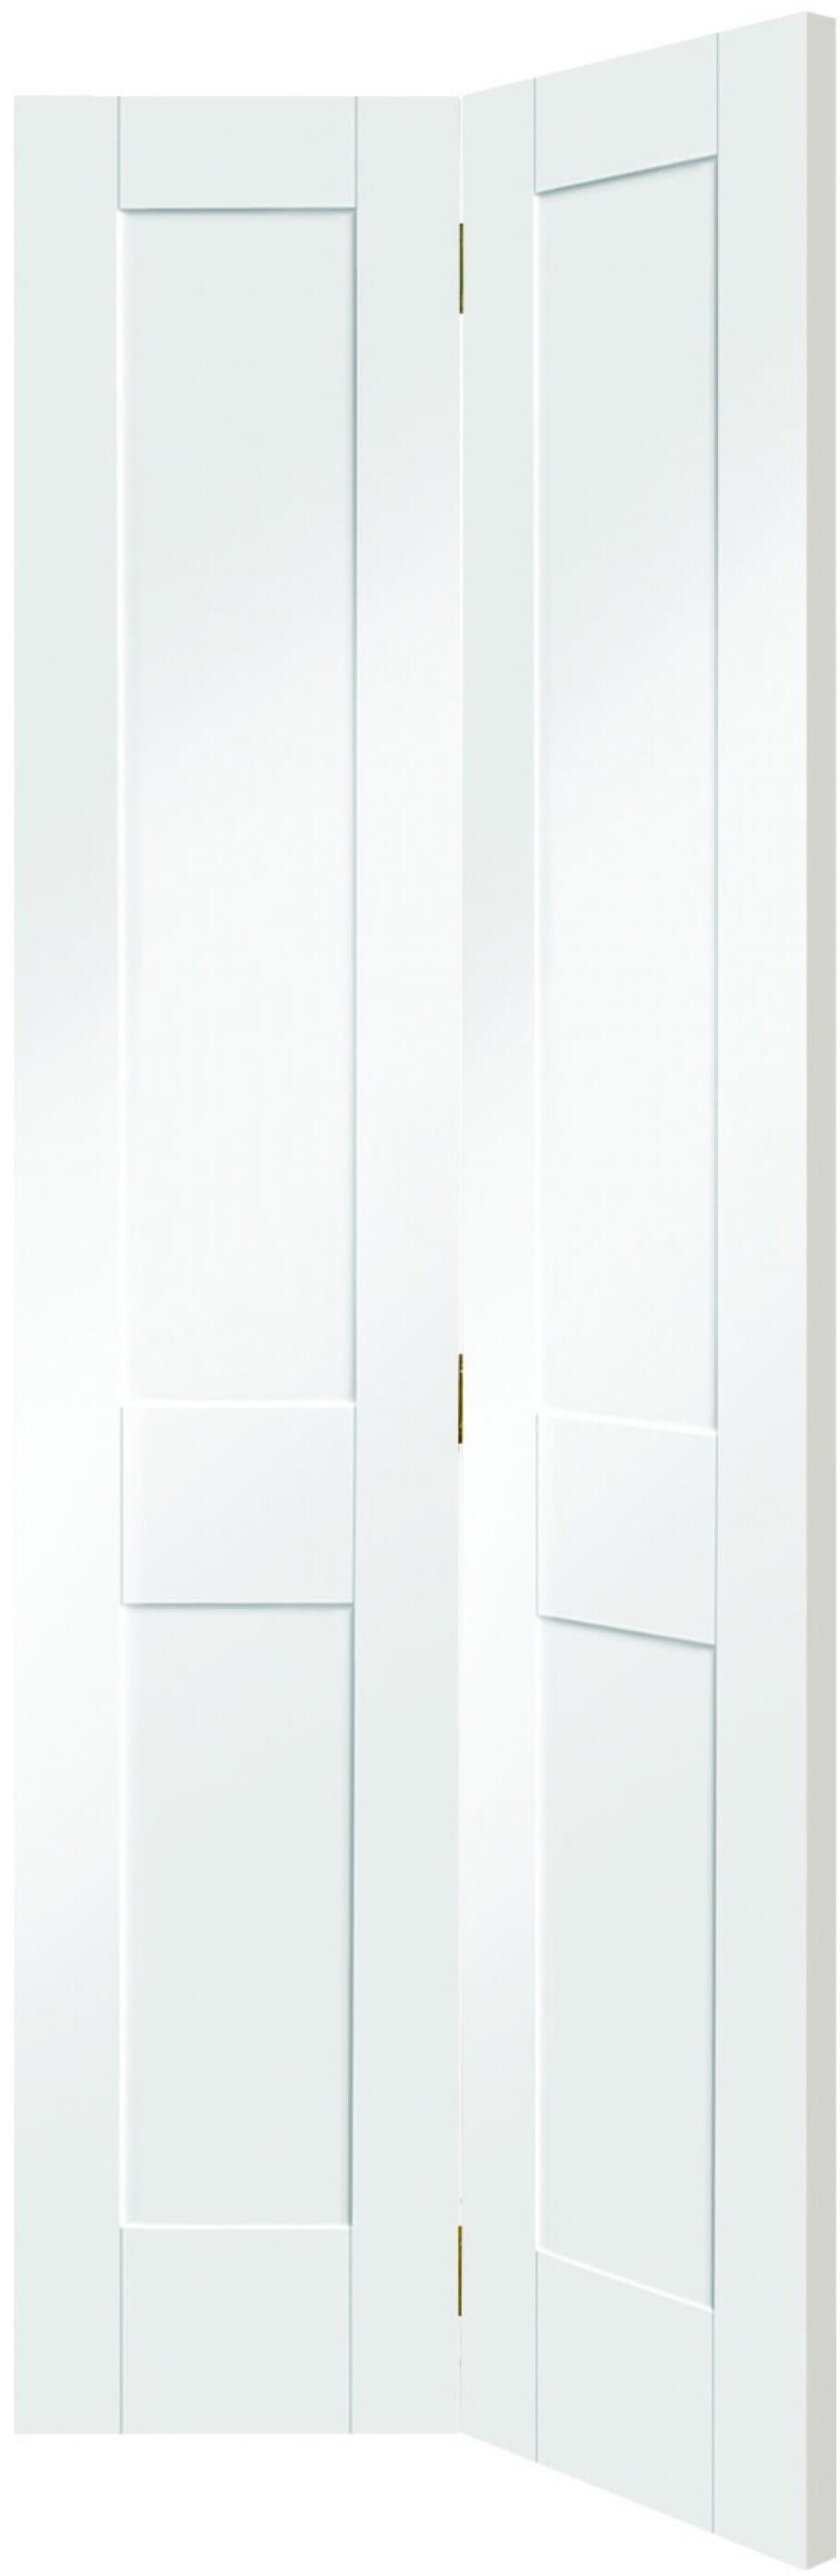 Victorian Shaker White Bi-fold Image